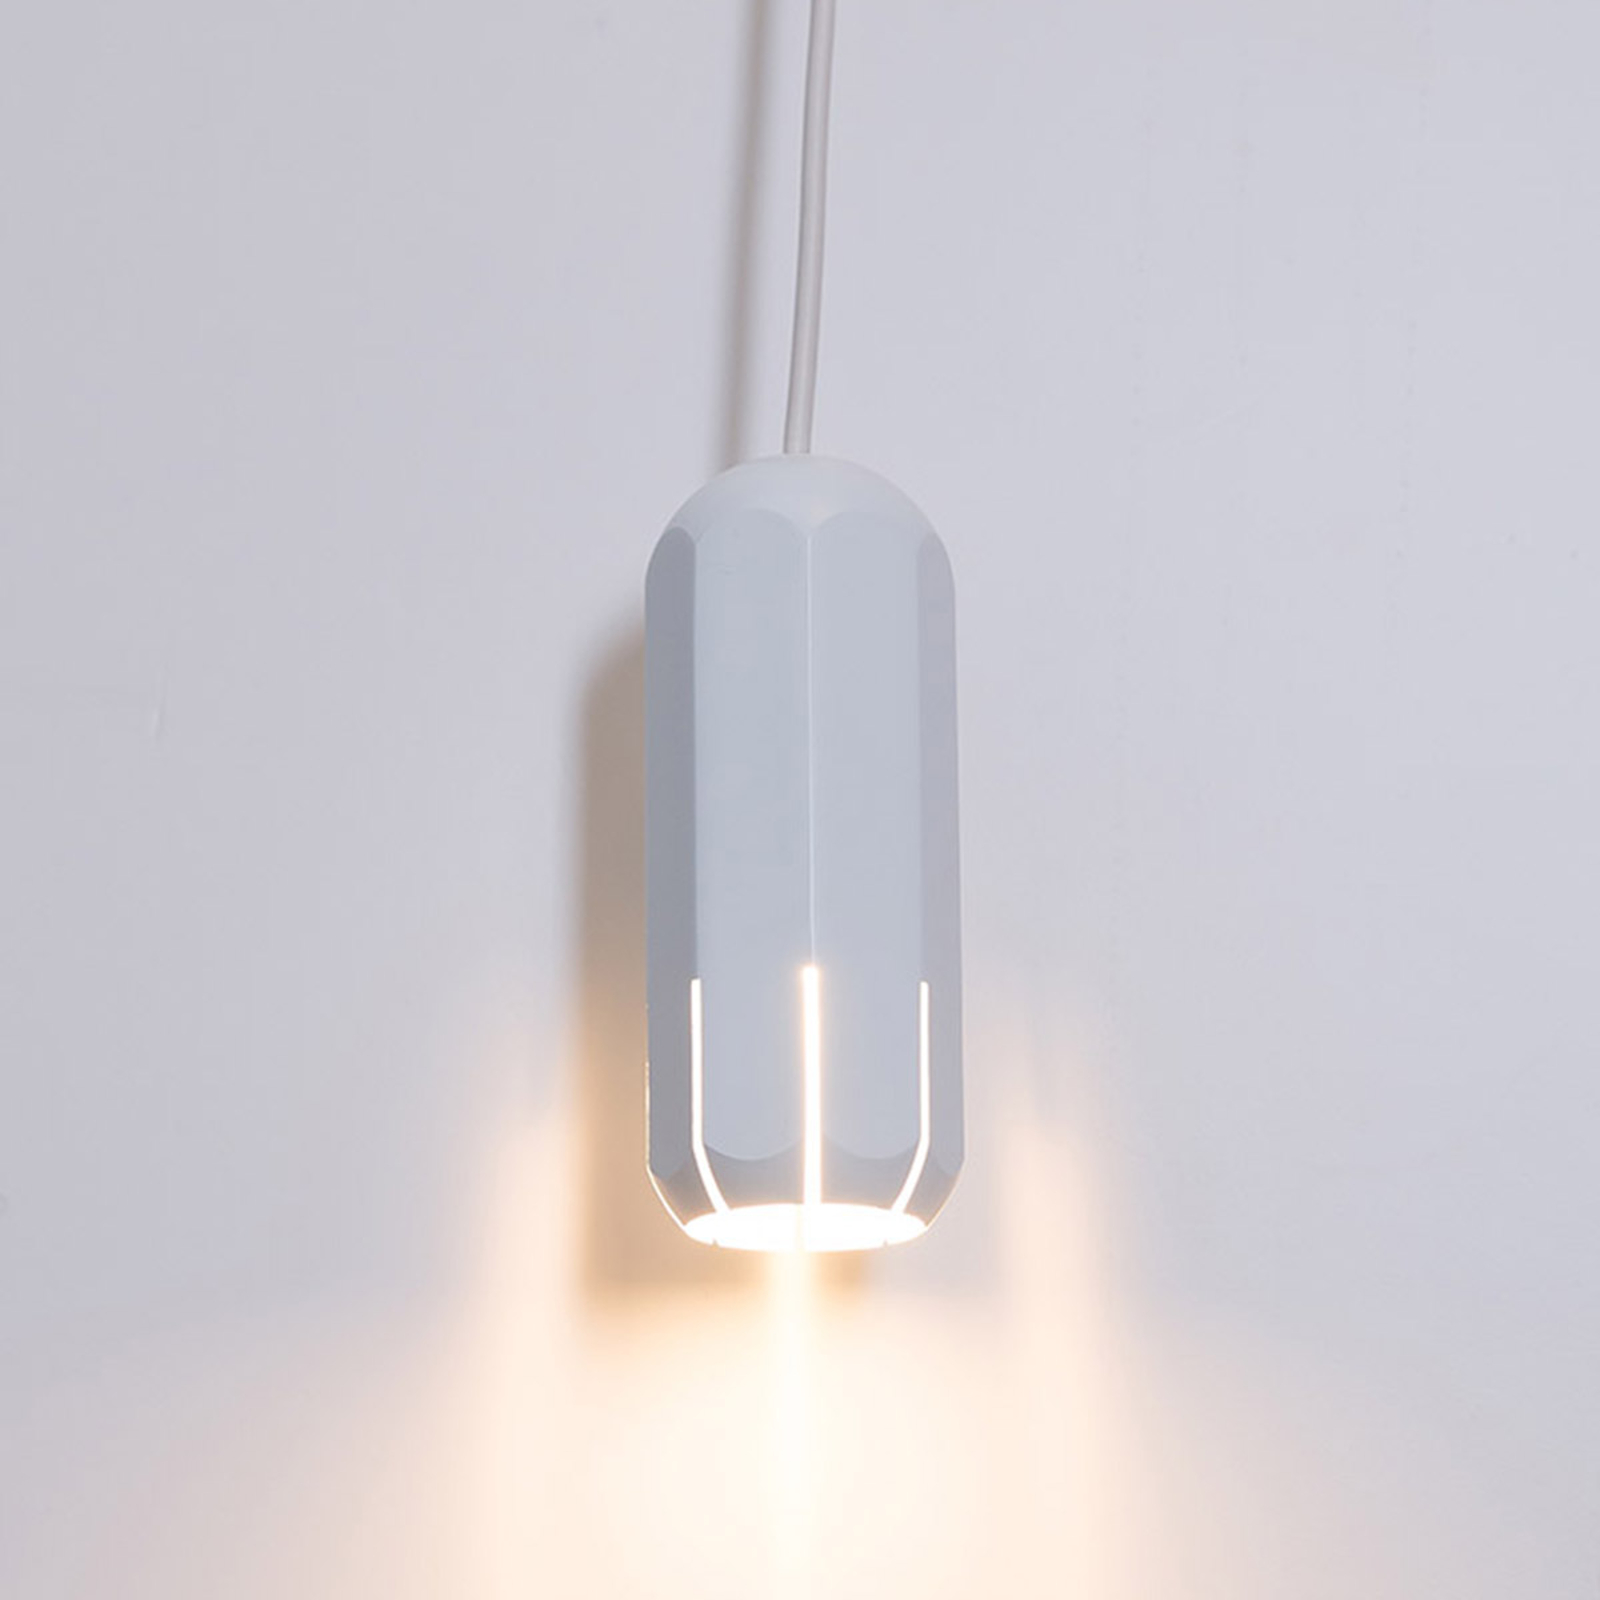 Innermost Brixton Spot 11 LED-hengelampe, hvit